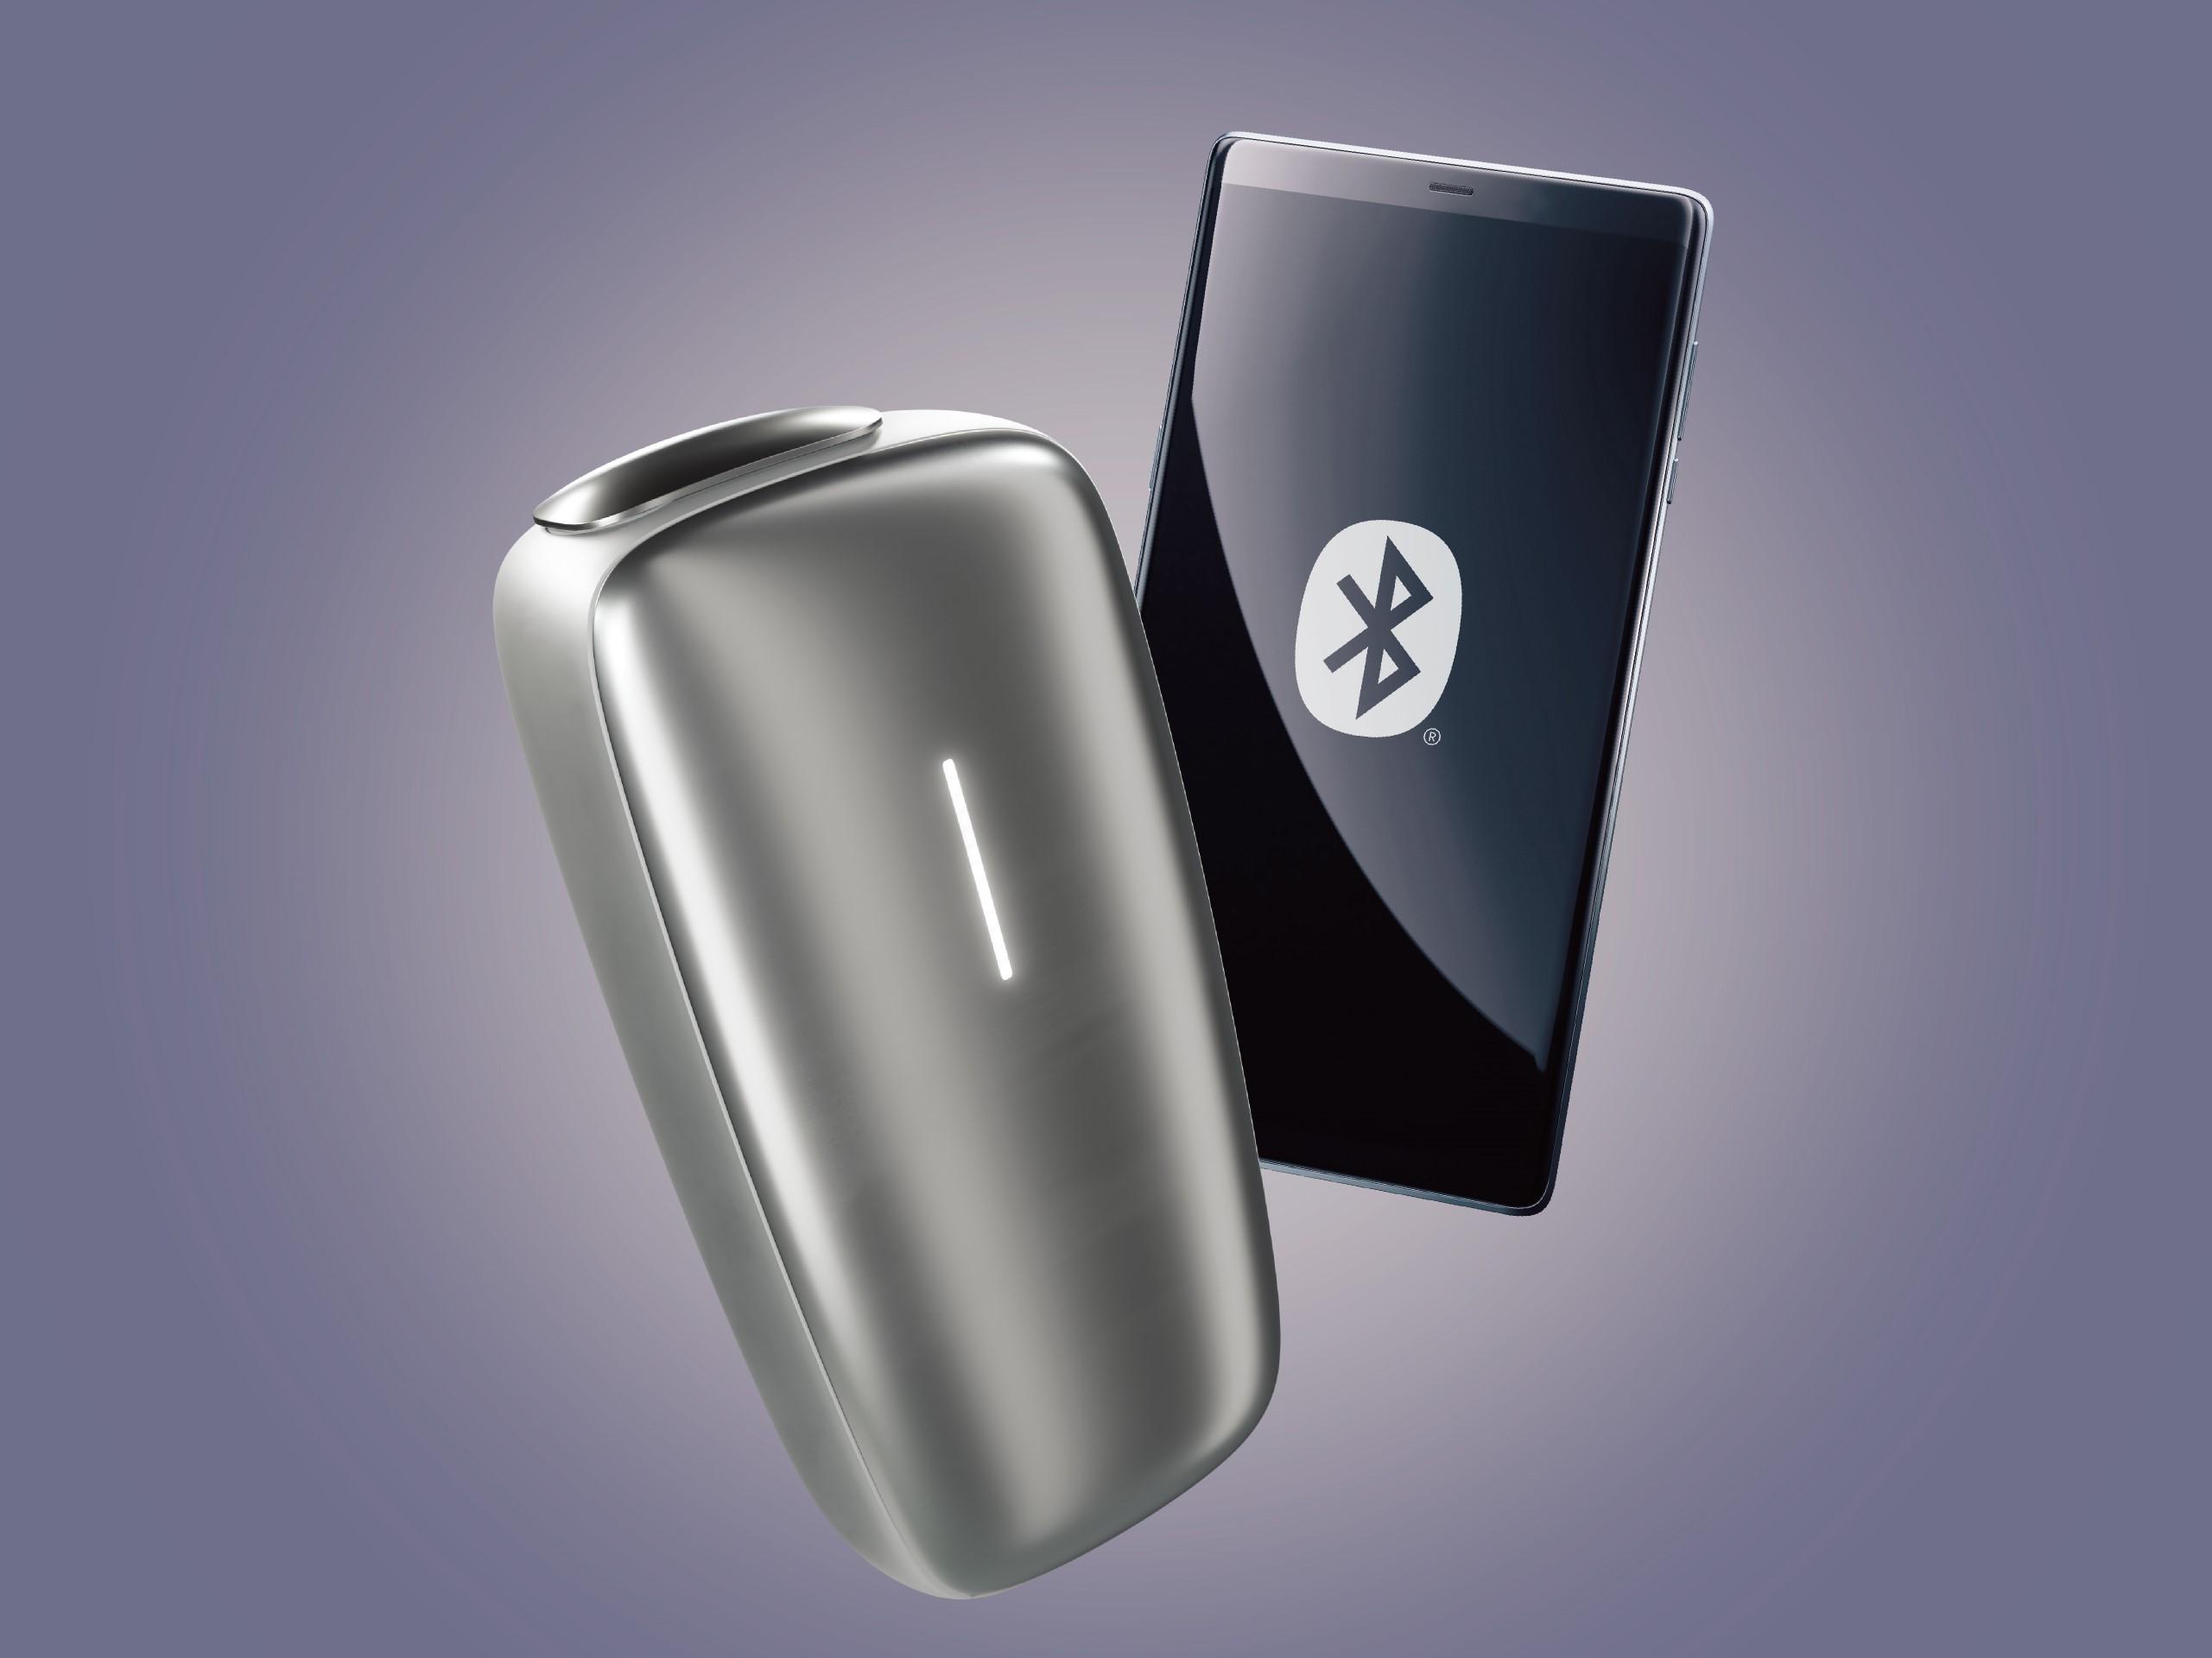 Bluetoothでスマートフォンと接続すれば、様々な便利な機能が使える。